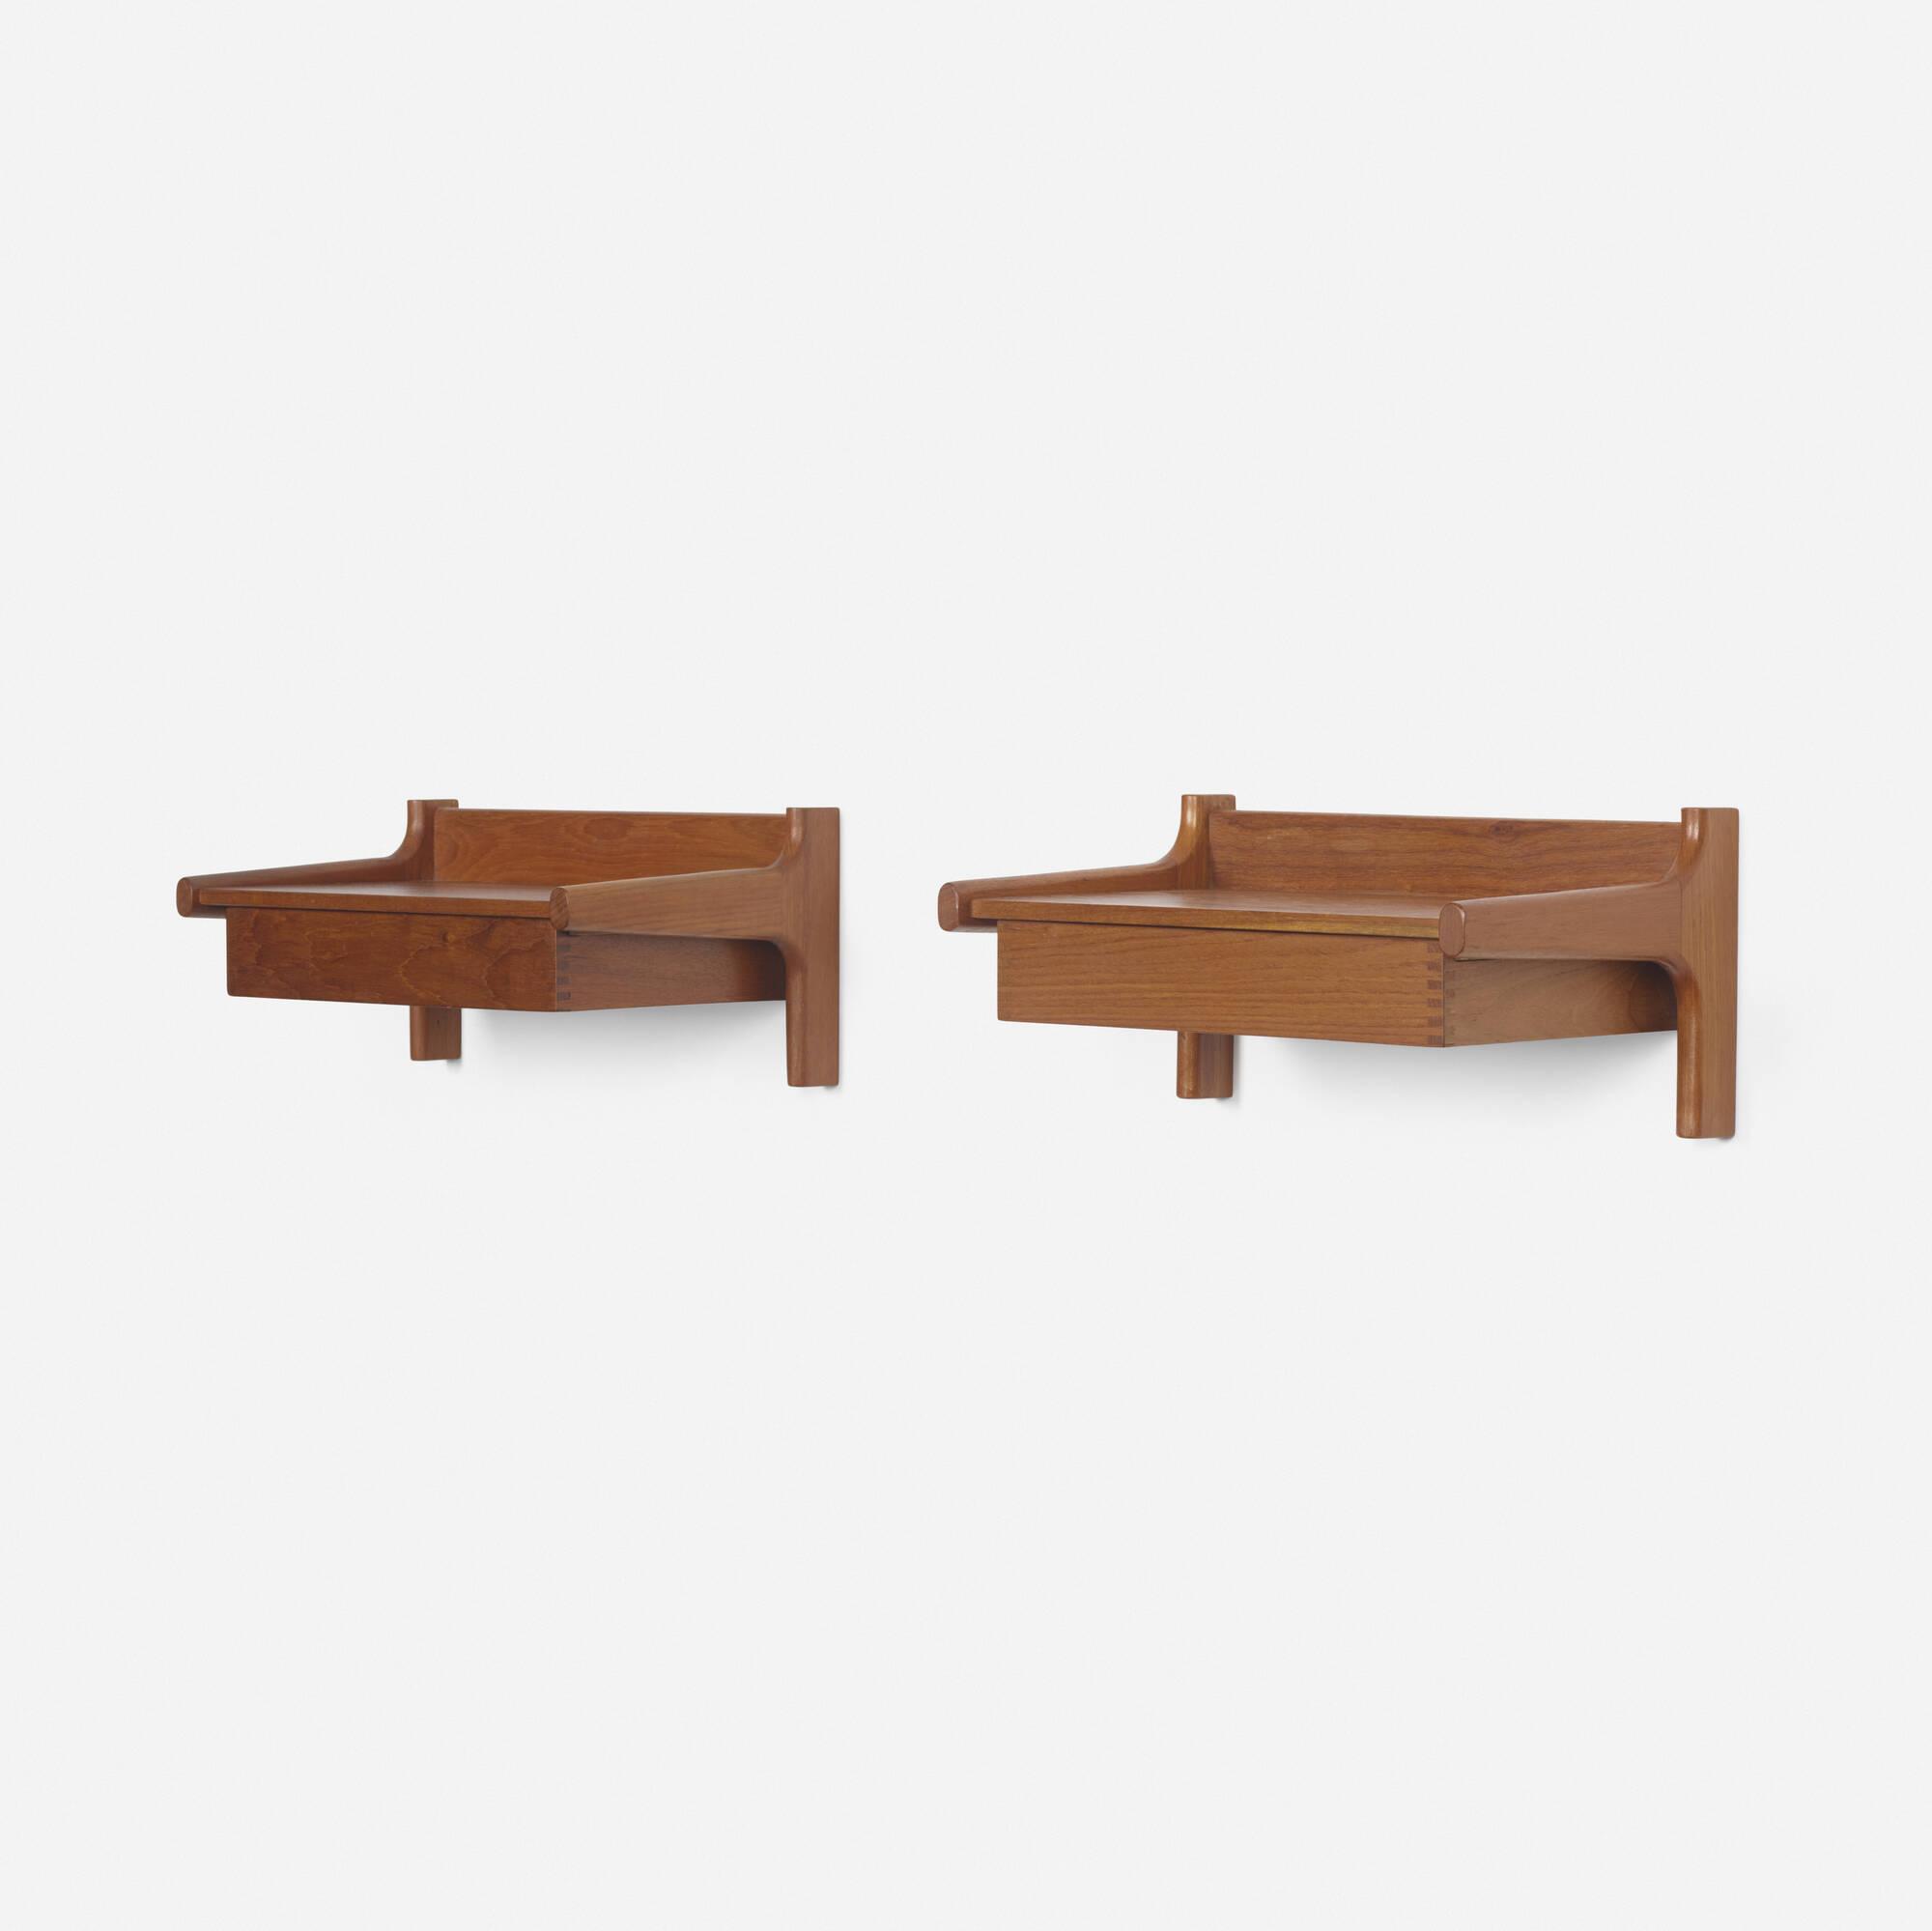 238: Børge Mogensen / wall-mounted nightstands, pair (1 of 2)